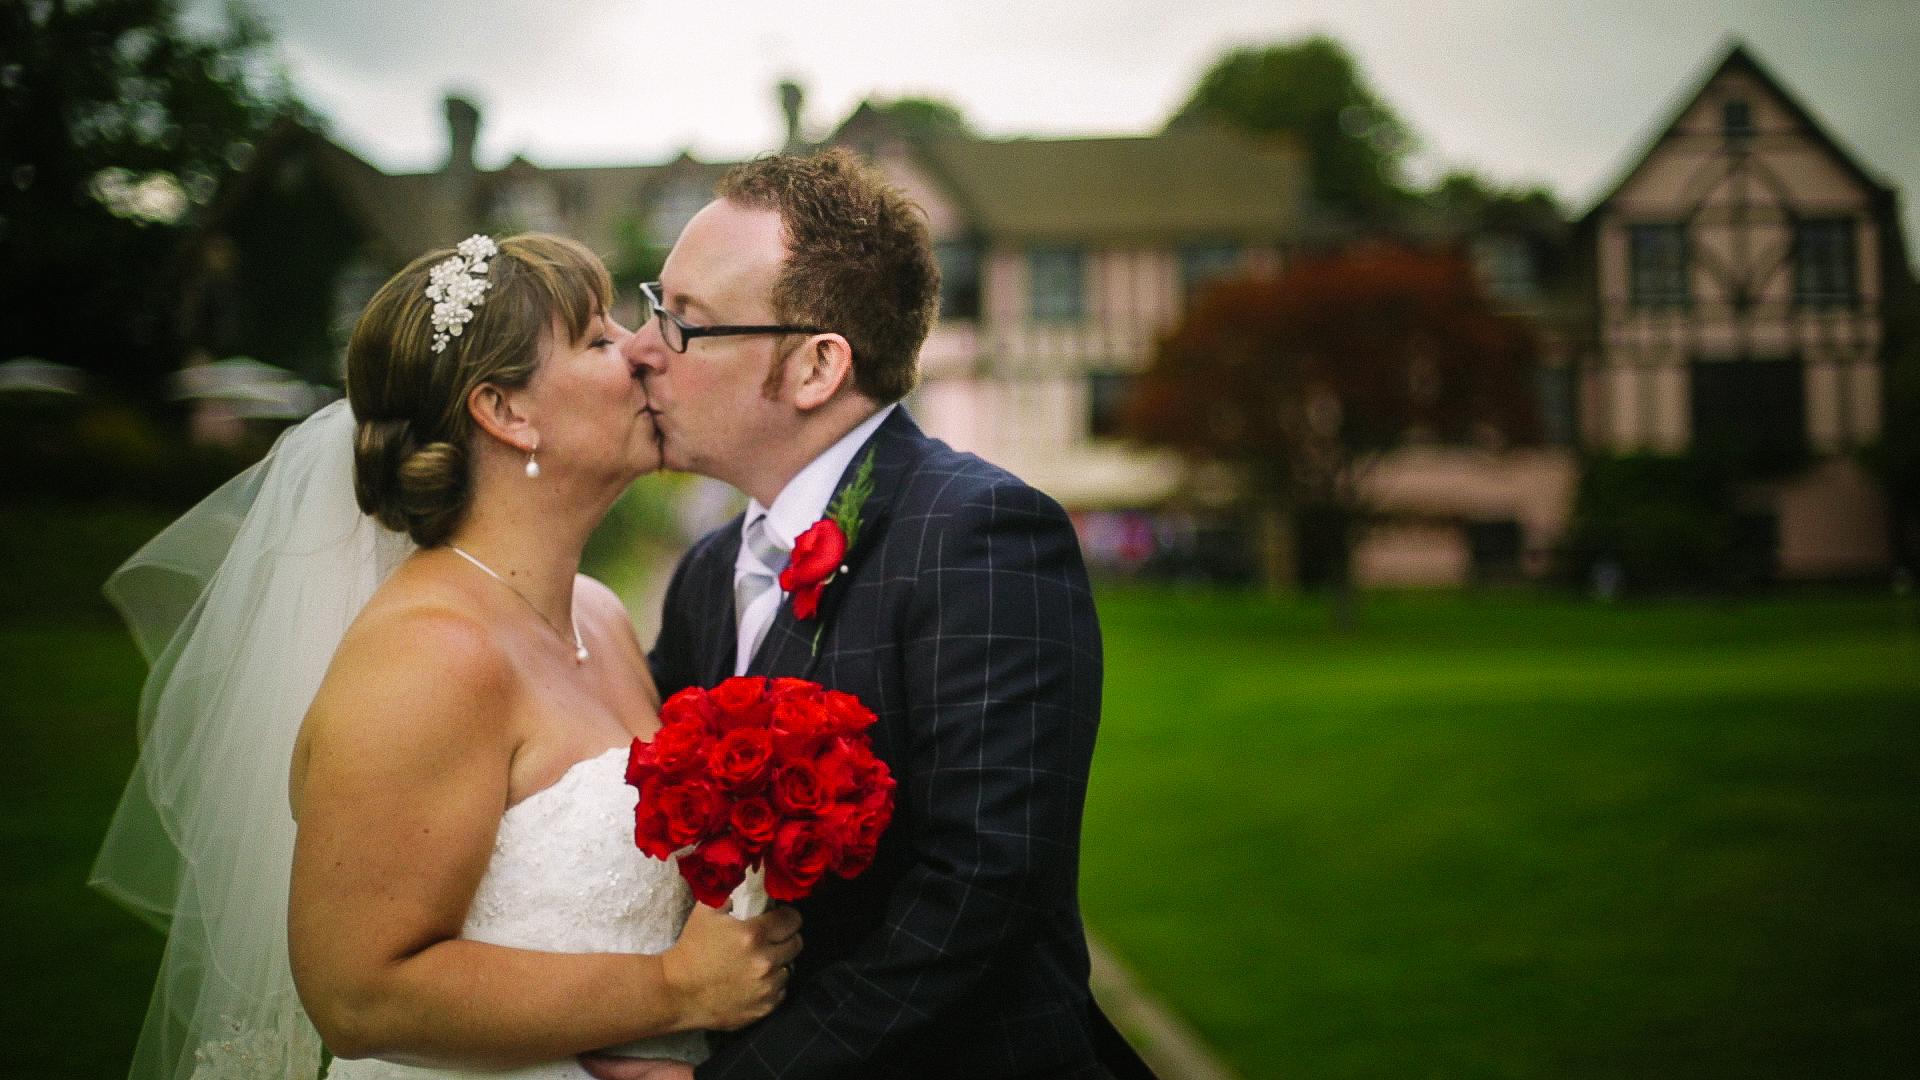 kent-videography-london-uk-destination-wedding-photography-Adam-Rowley